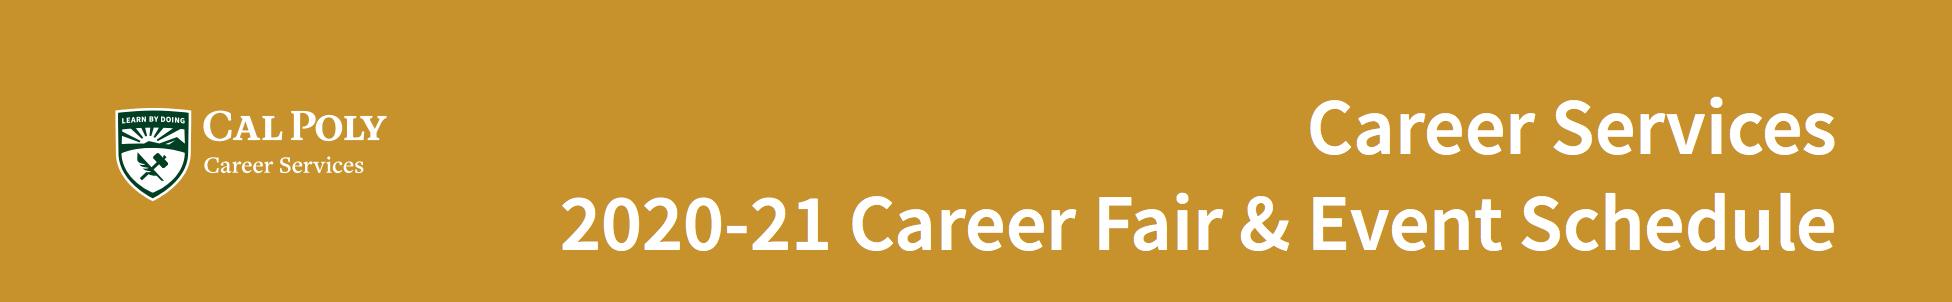 Career Fair Schedule 2020-2021